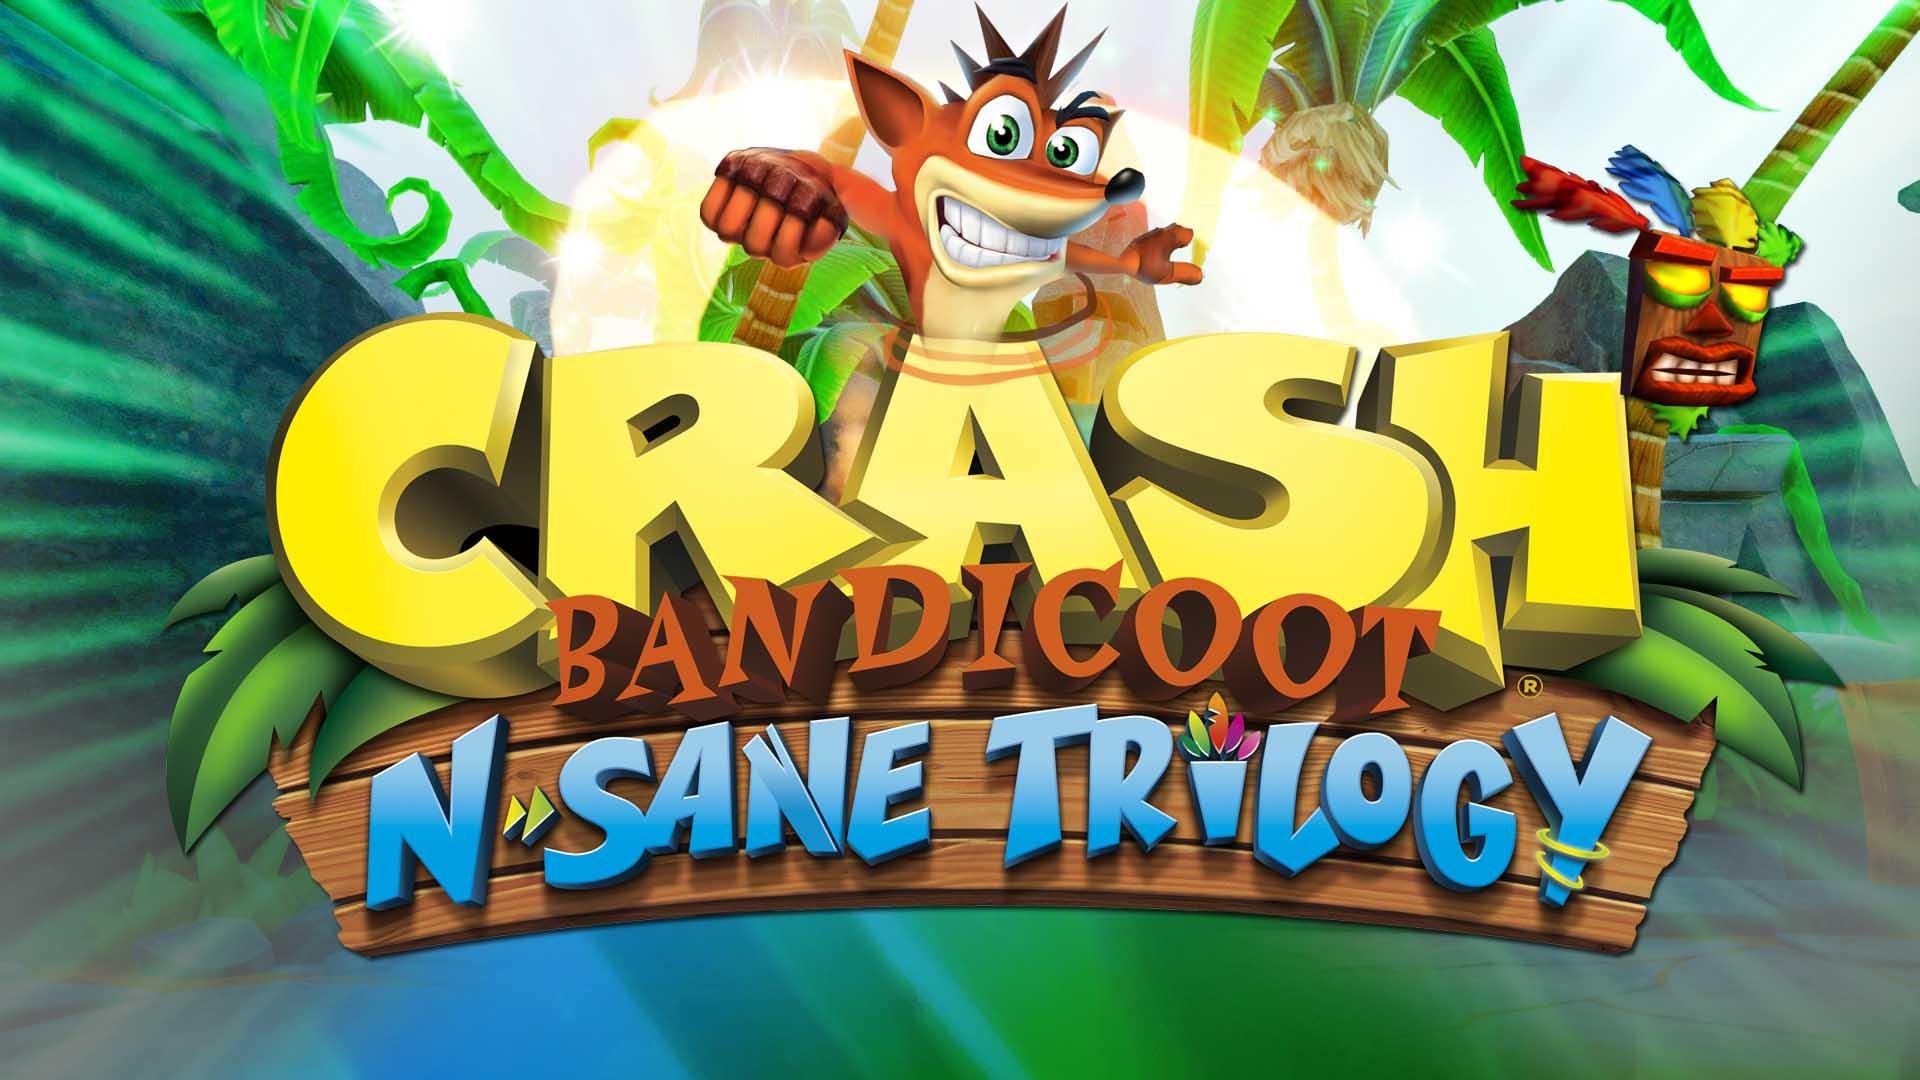 humble bundle crash bandicoot